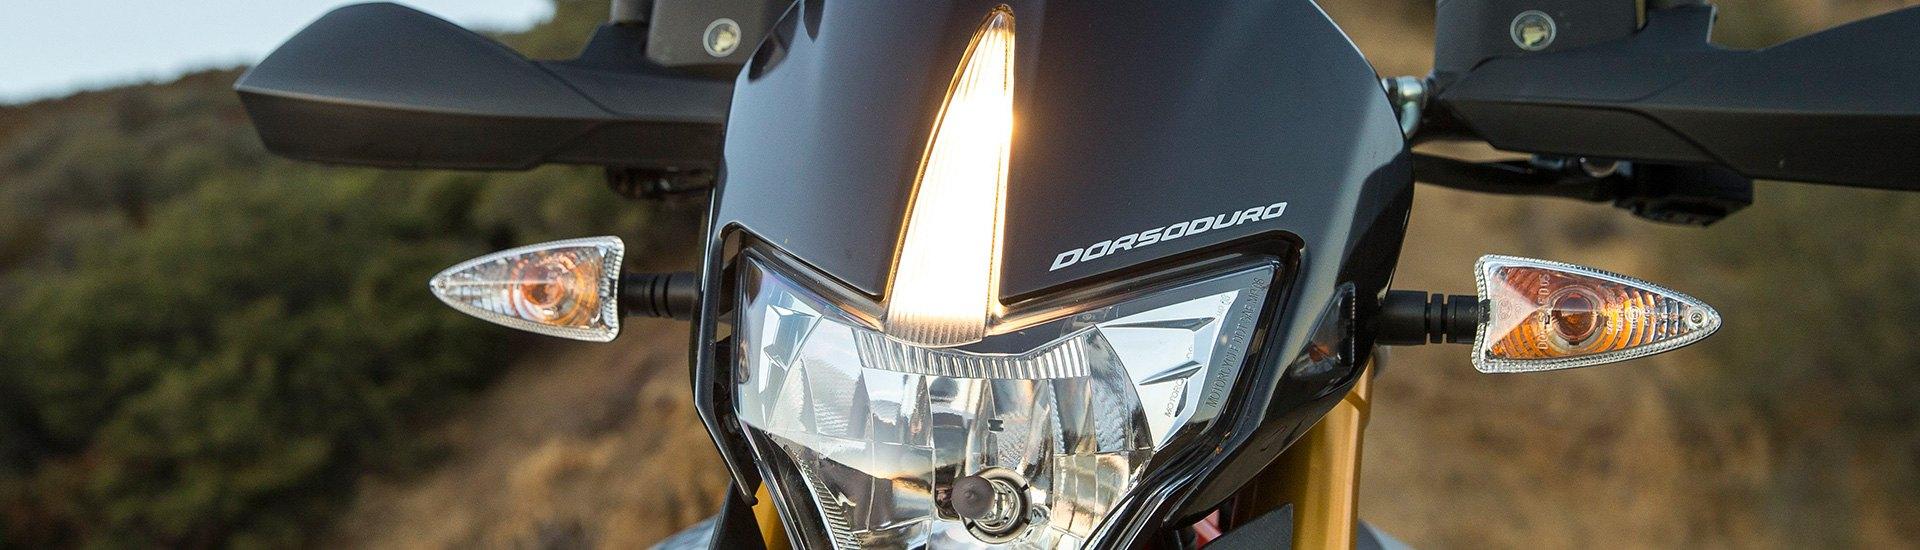 Yamaha XT225 Lighting | Headlights, Tail Lights, Signal